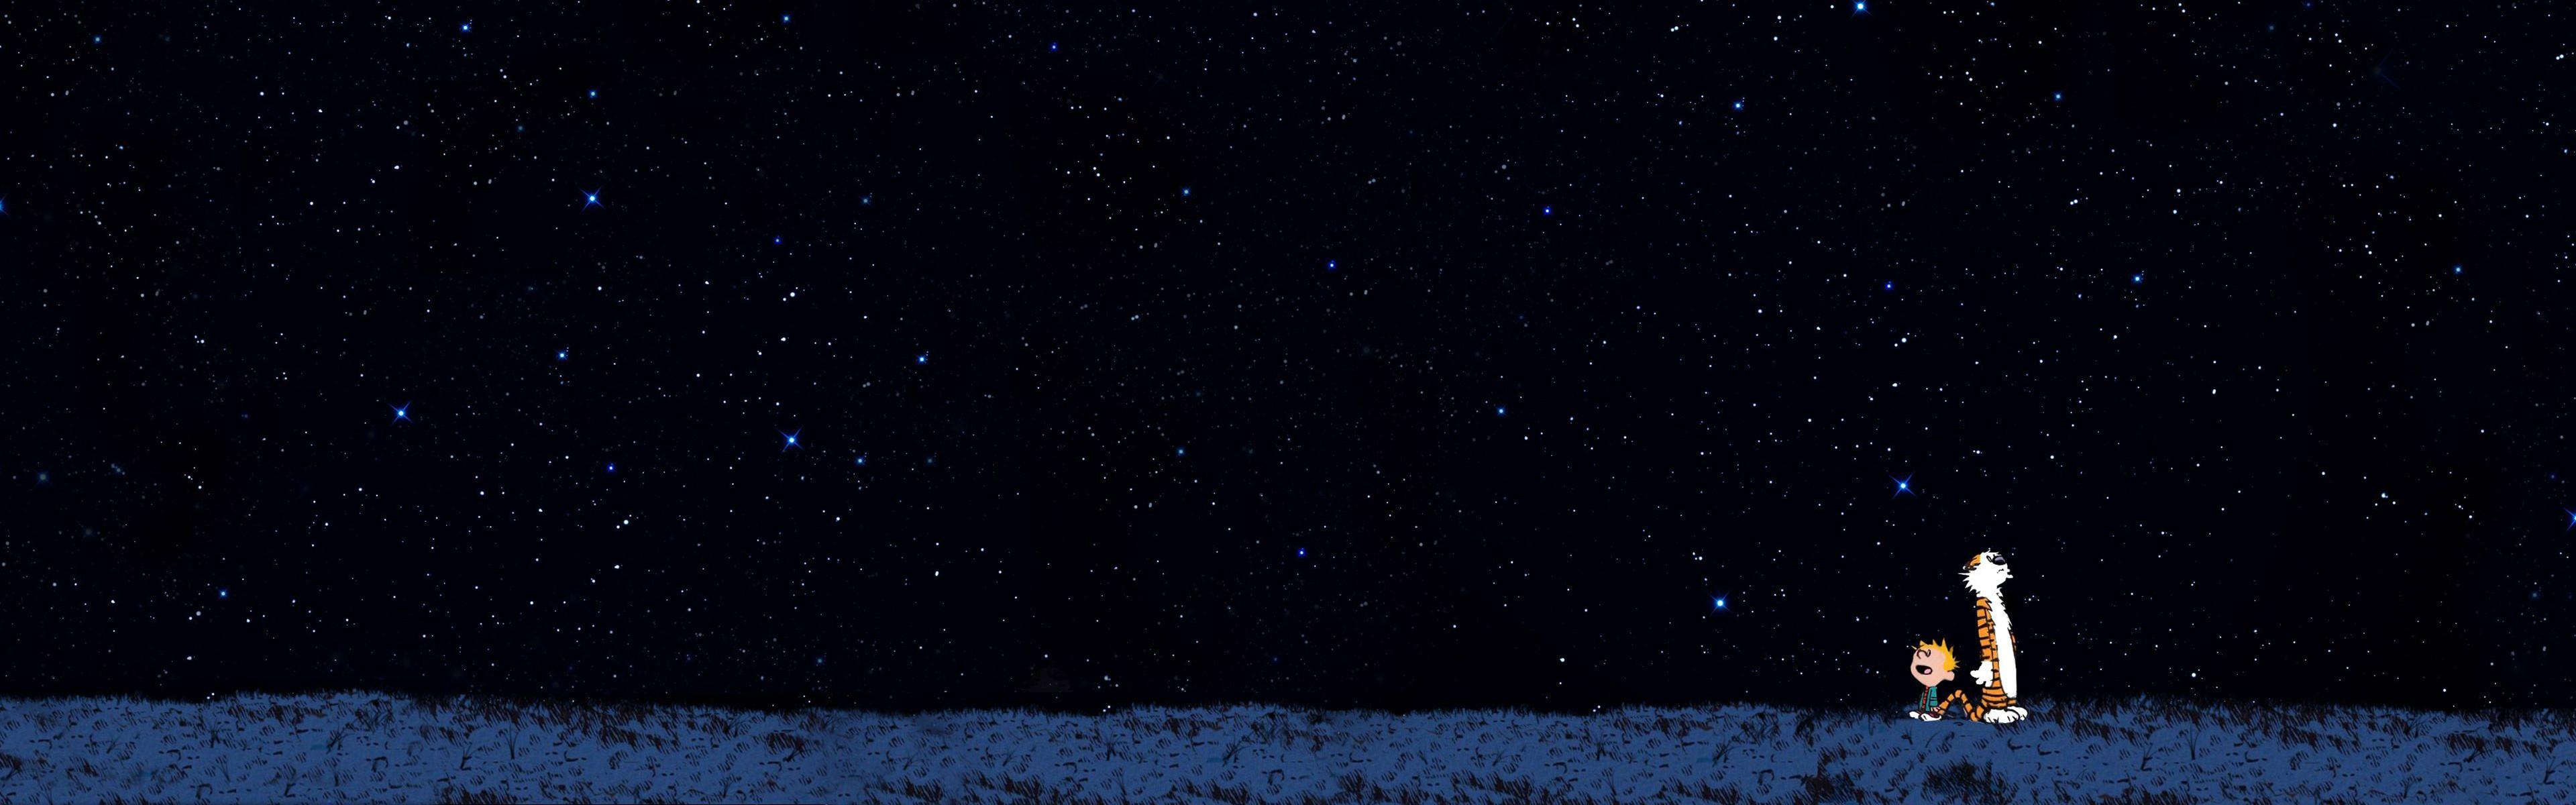 anime starry night sky wallpaper